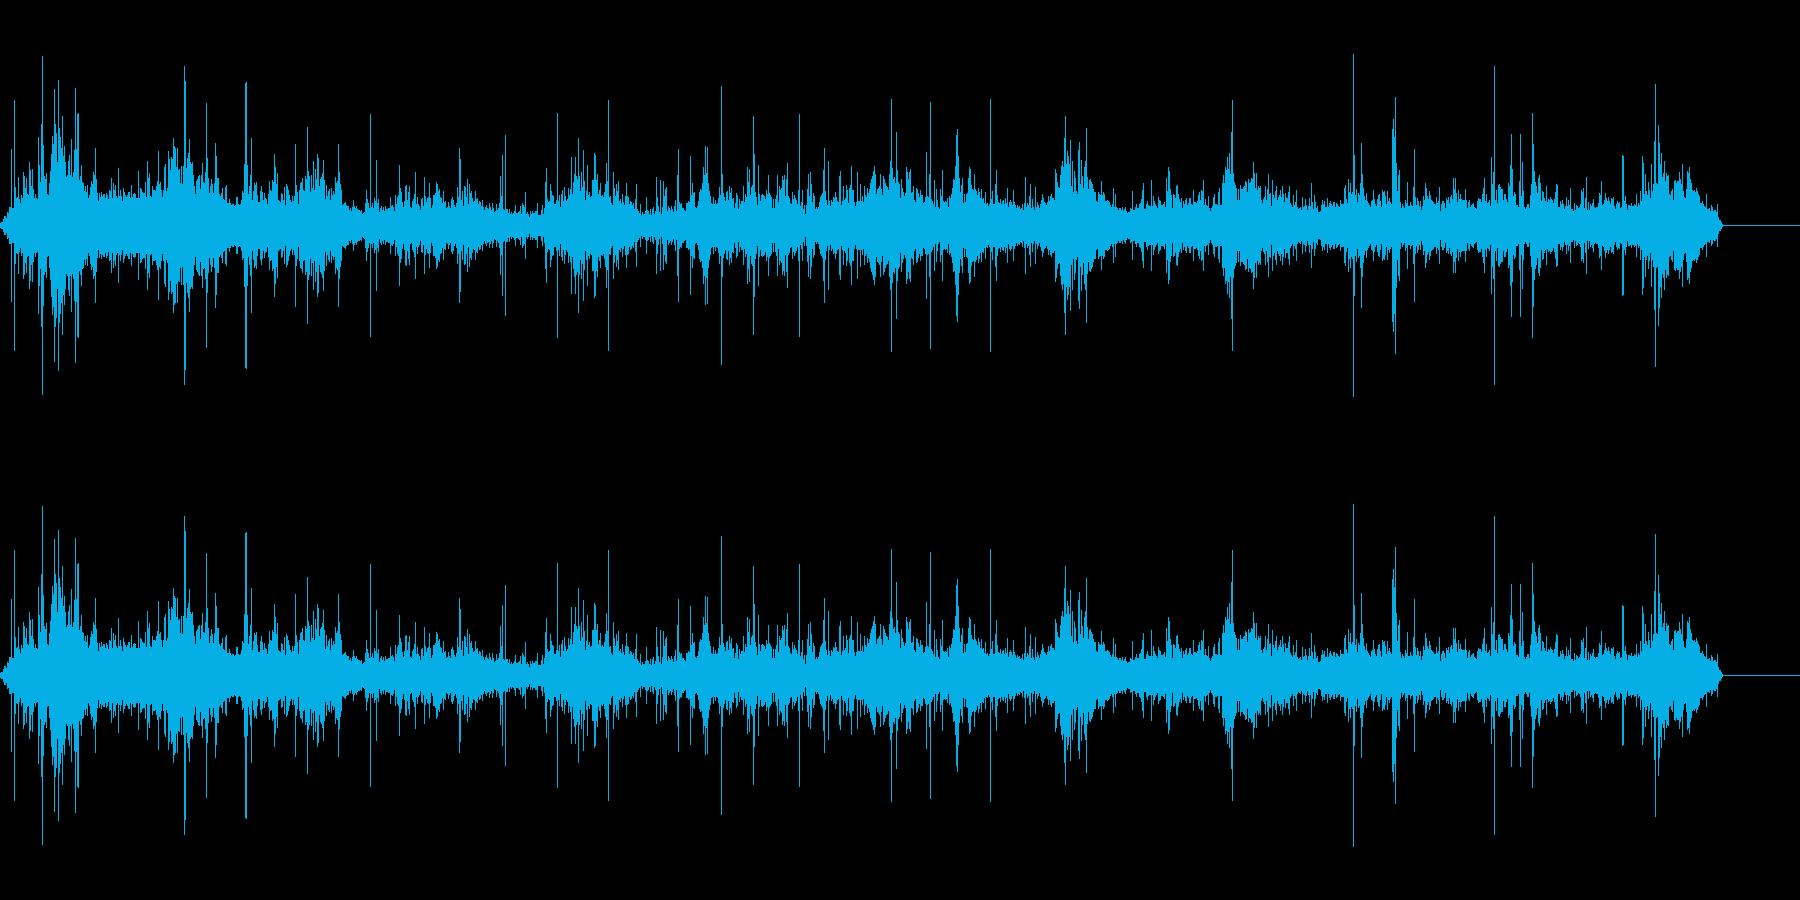 WAVES-ストーンオンザショアの再生済みの波形